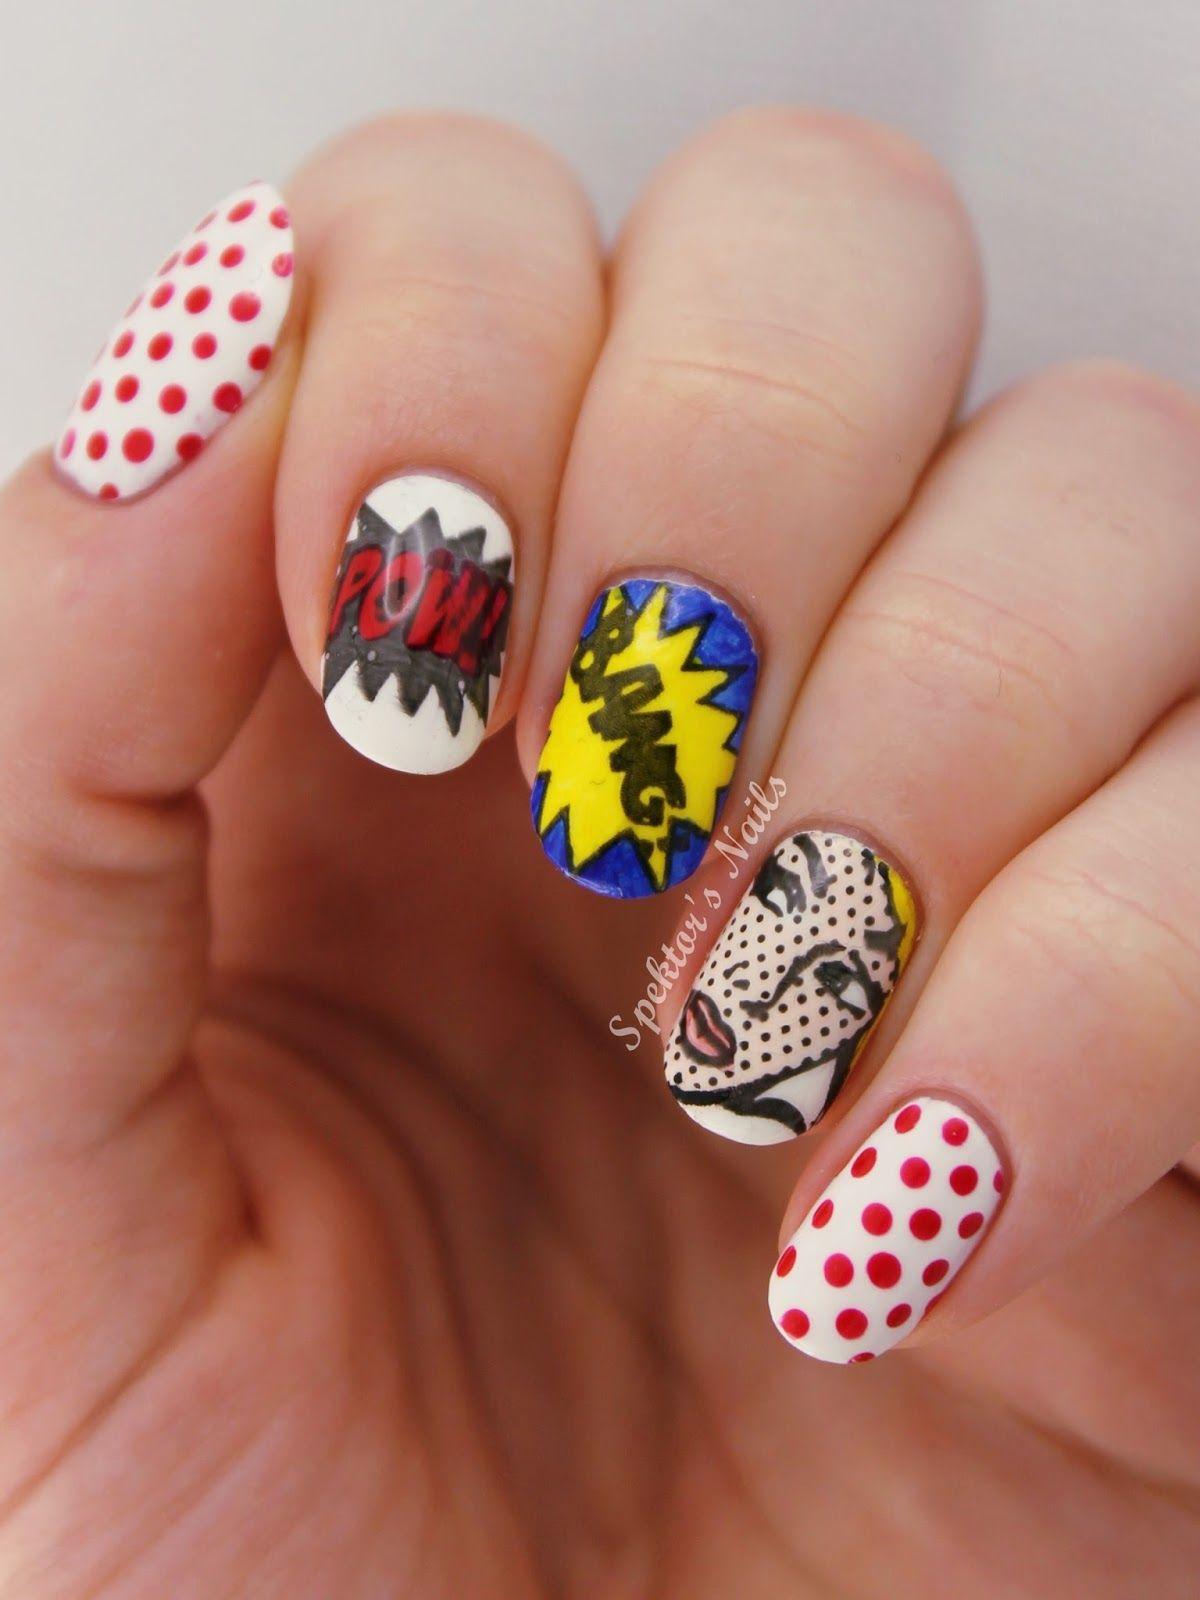 images?q=tbn:ANd9GcQh_l3eQ5xwiPy07kGEXjmjgmBKBRB7H2mRxCGhv1tFWg5c_mWT Awesome Pop Art Nails @koolgadgetz.com.info